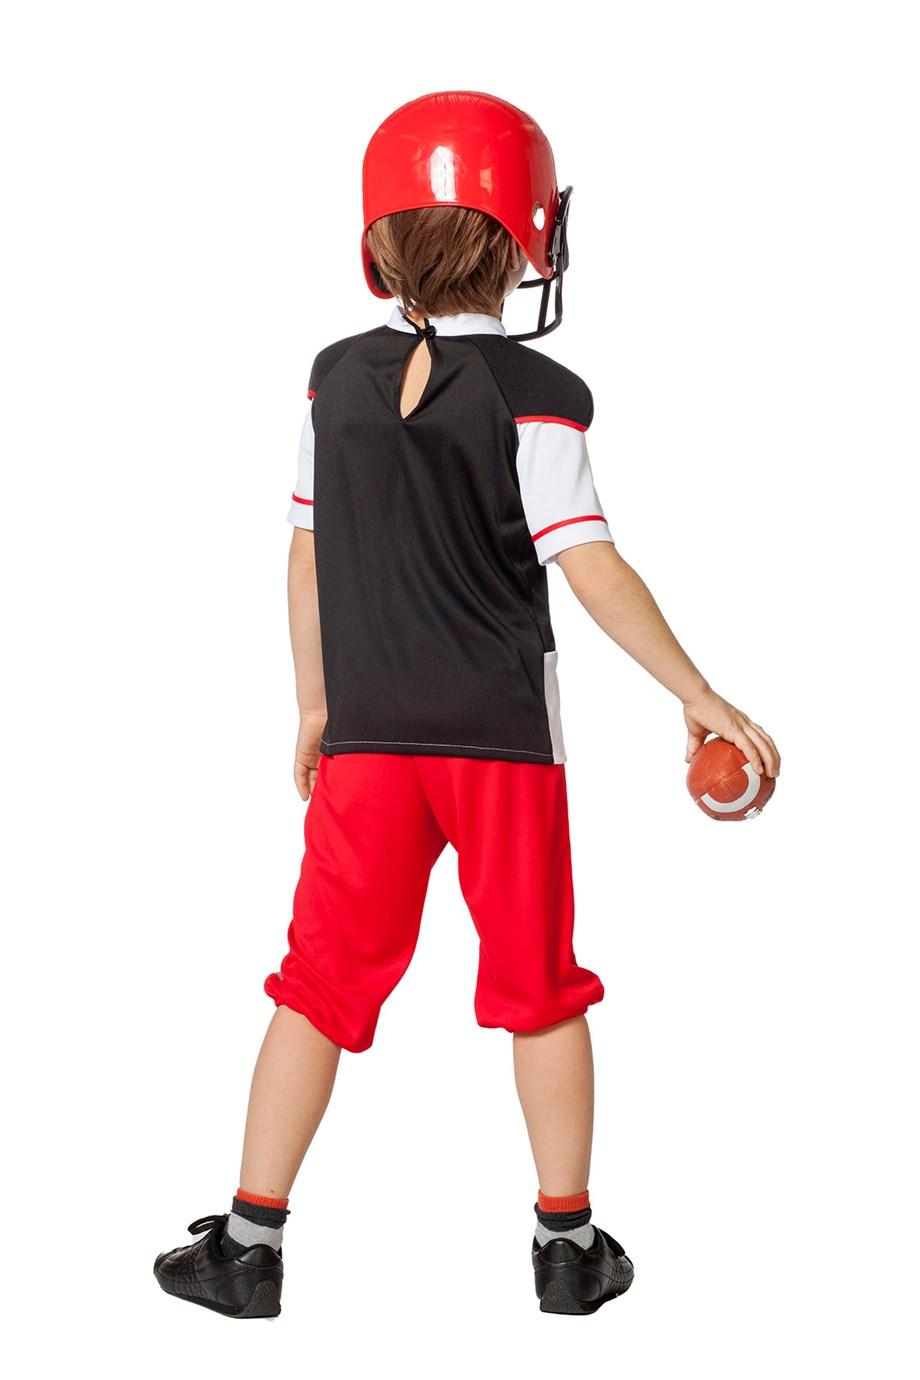 American Football-226840